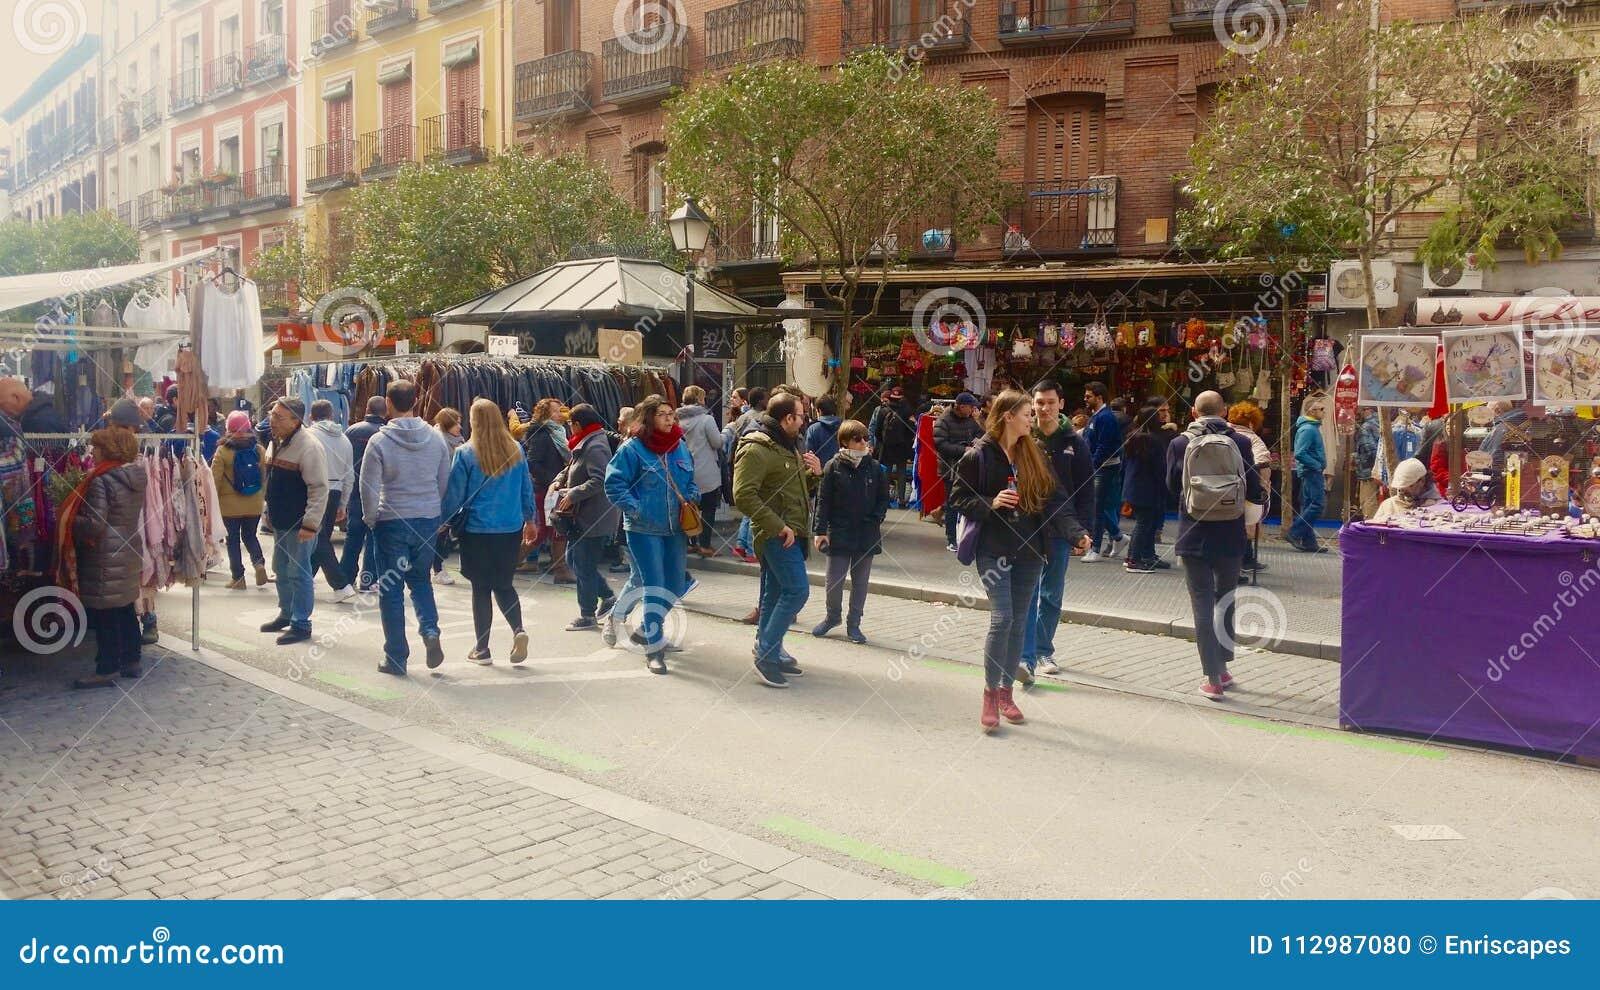 People in Rastro market of Madrid